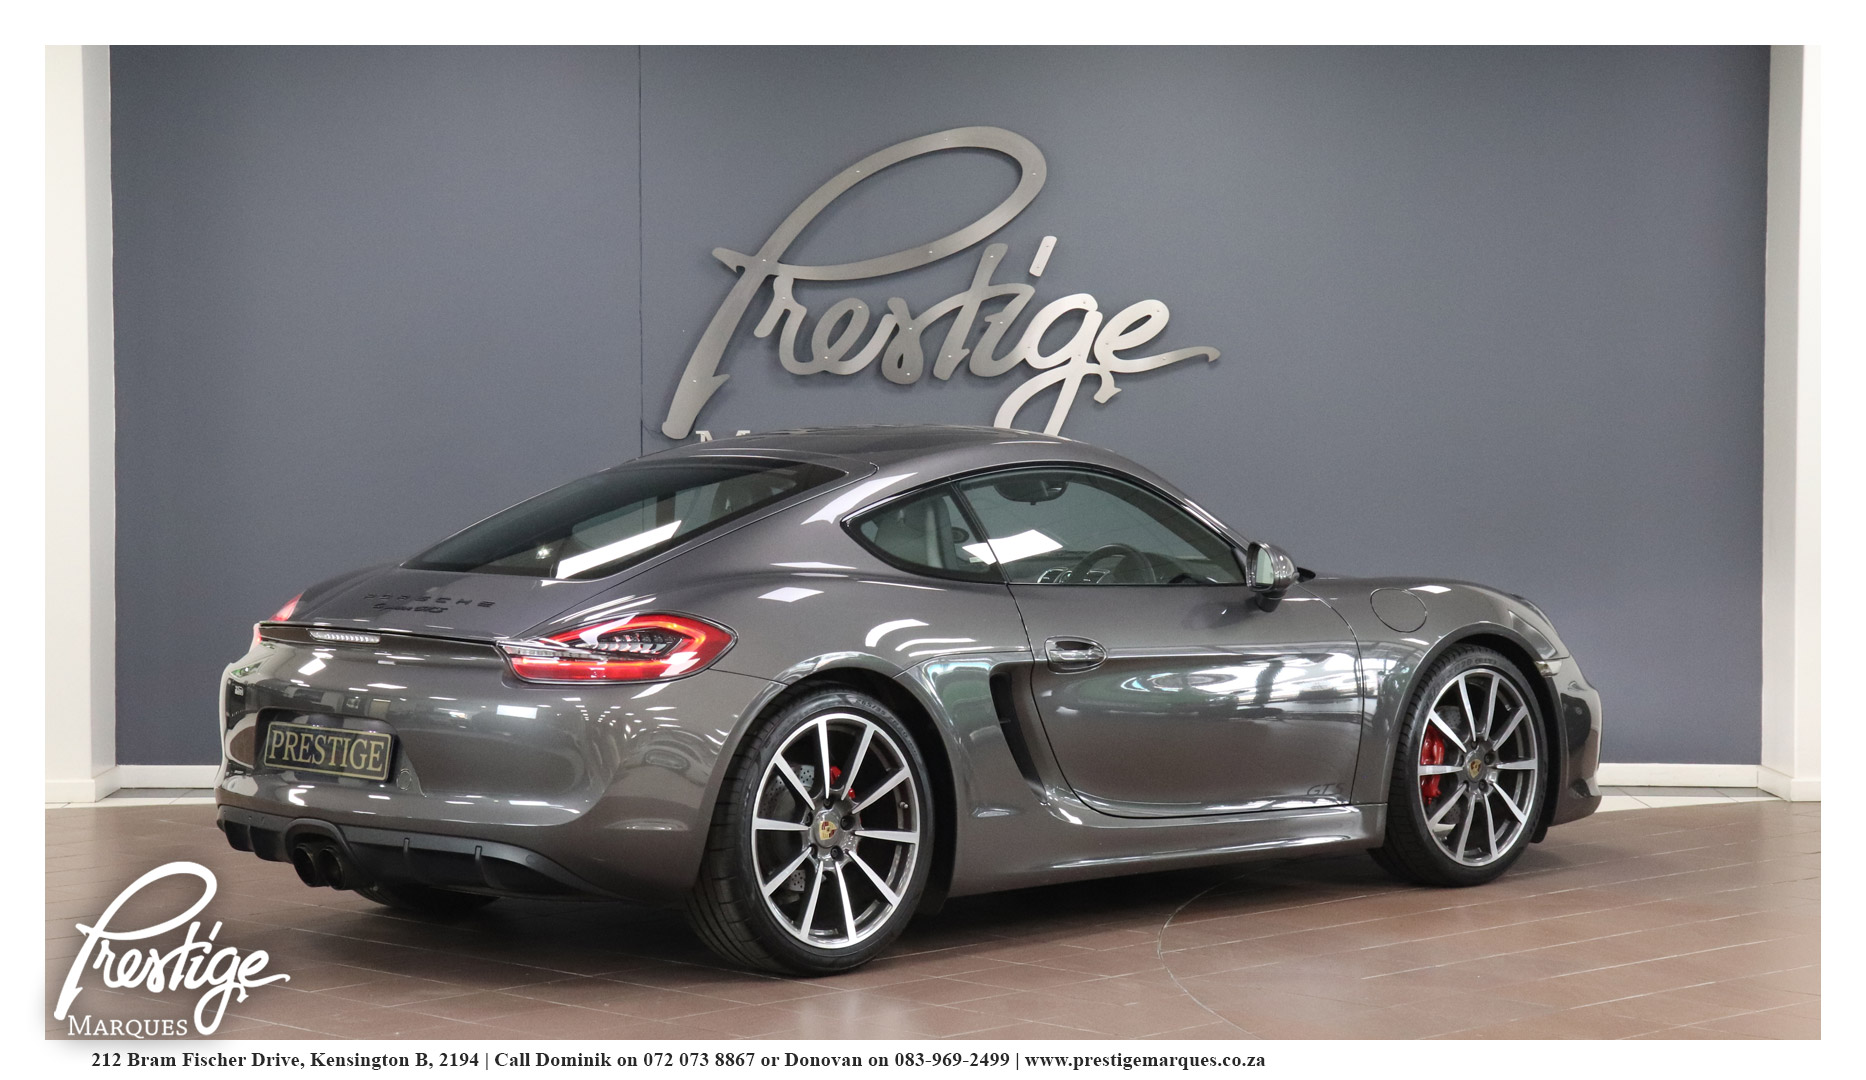 2015-Porsche-Cayman-GTS PDK-Prestige-Marques-Randburg-Sandton-3